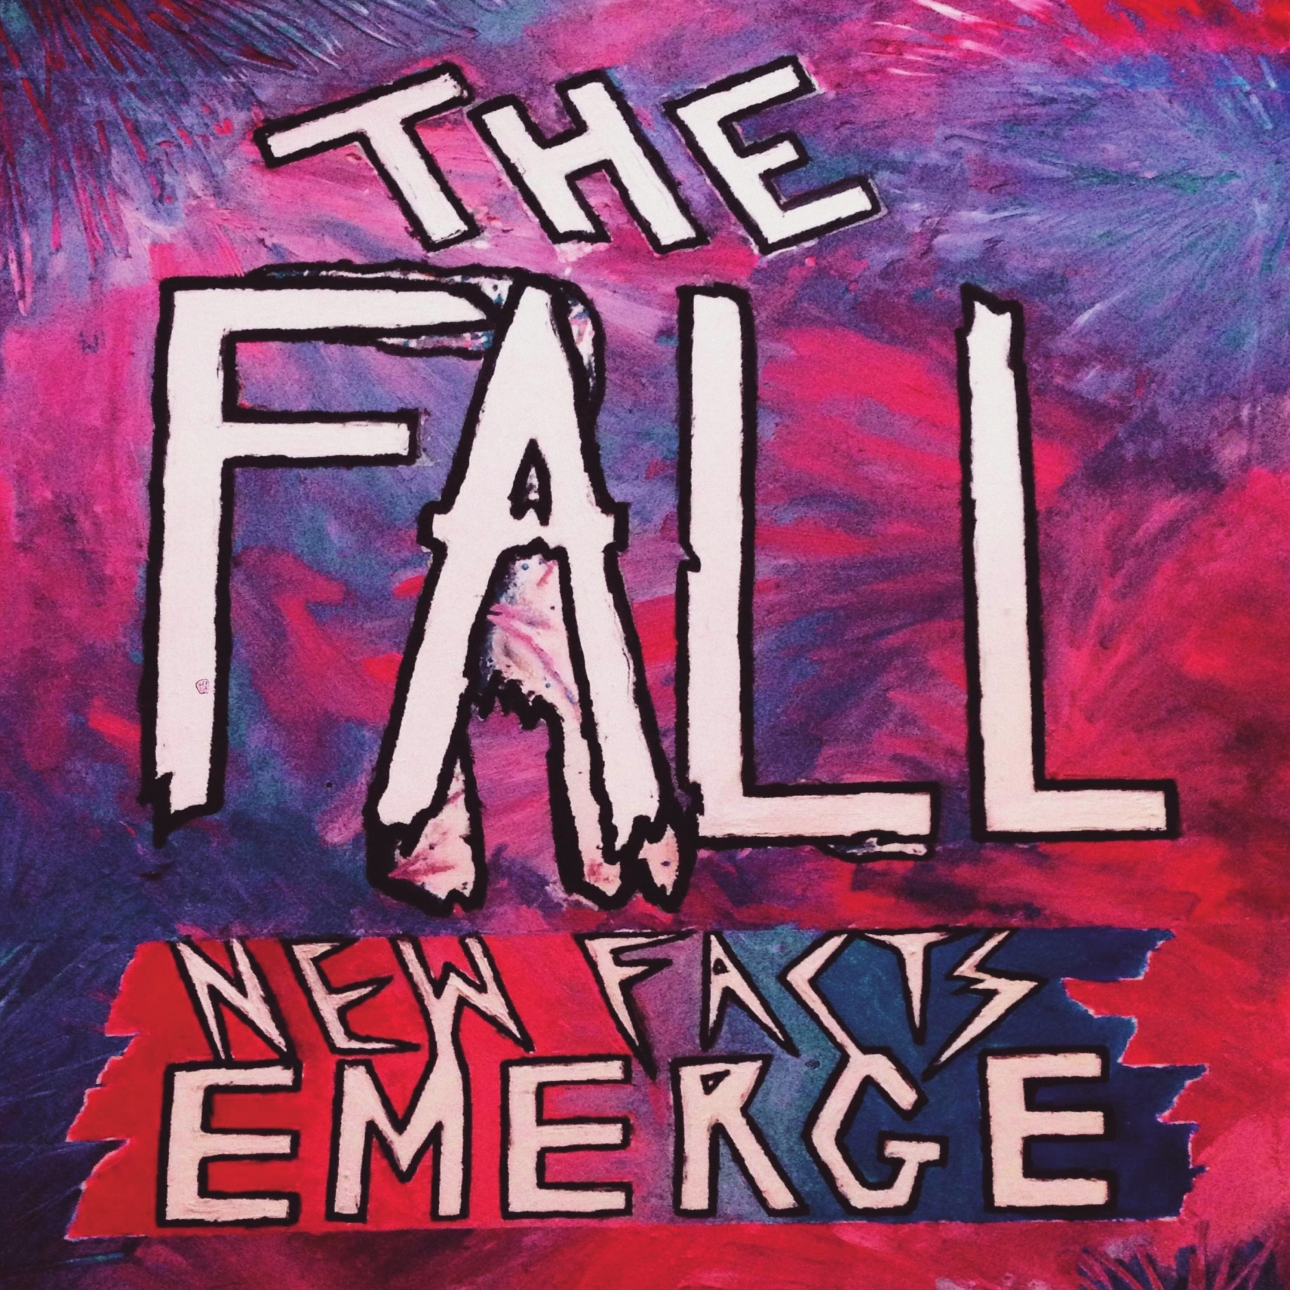 cd46b3c45f New Facts Emerge the latest installment in The Fall s progressive decline